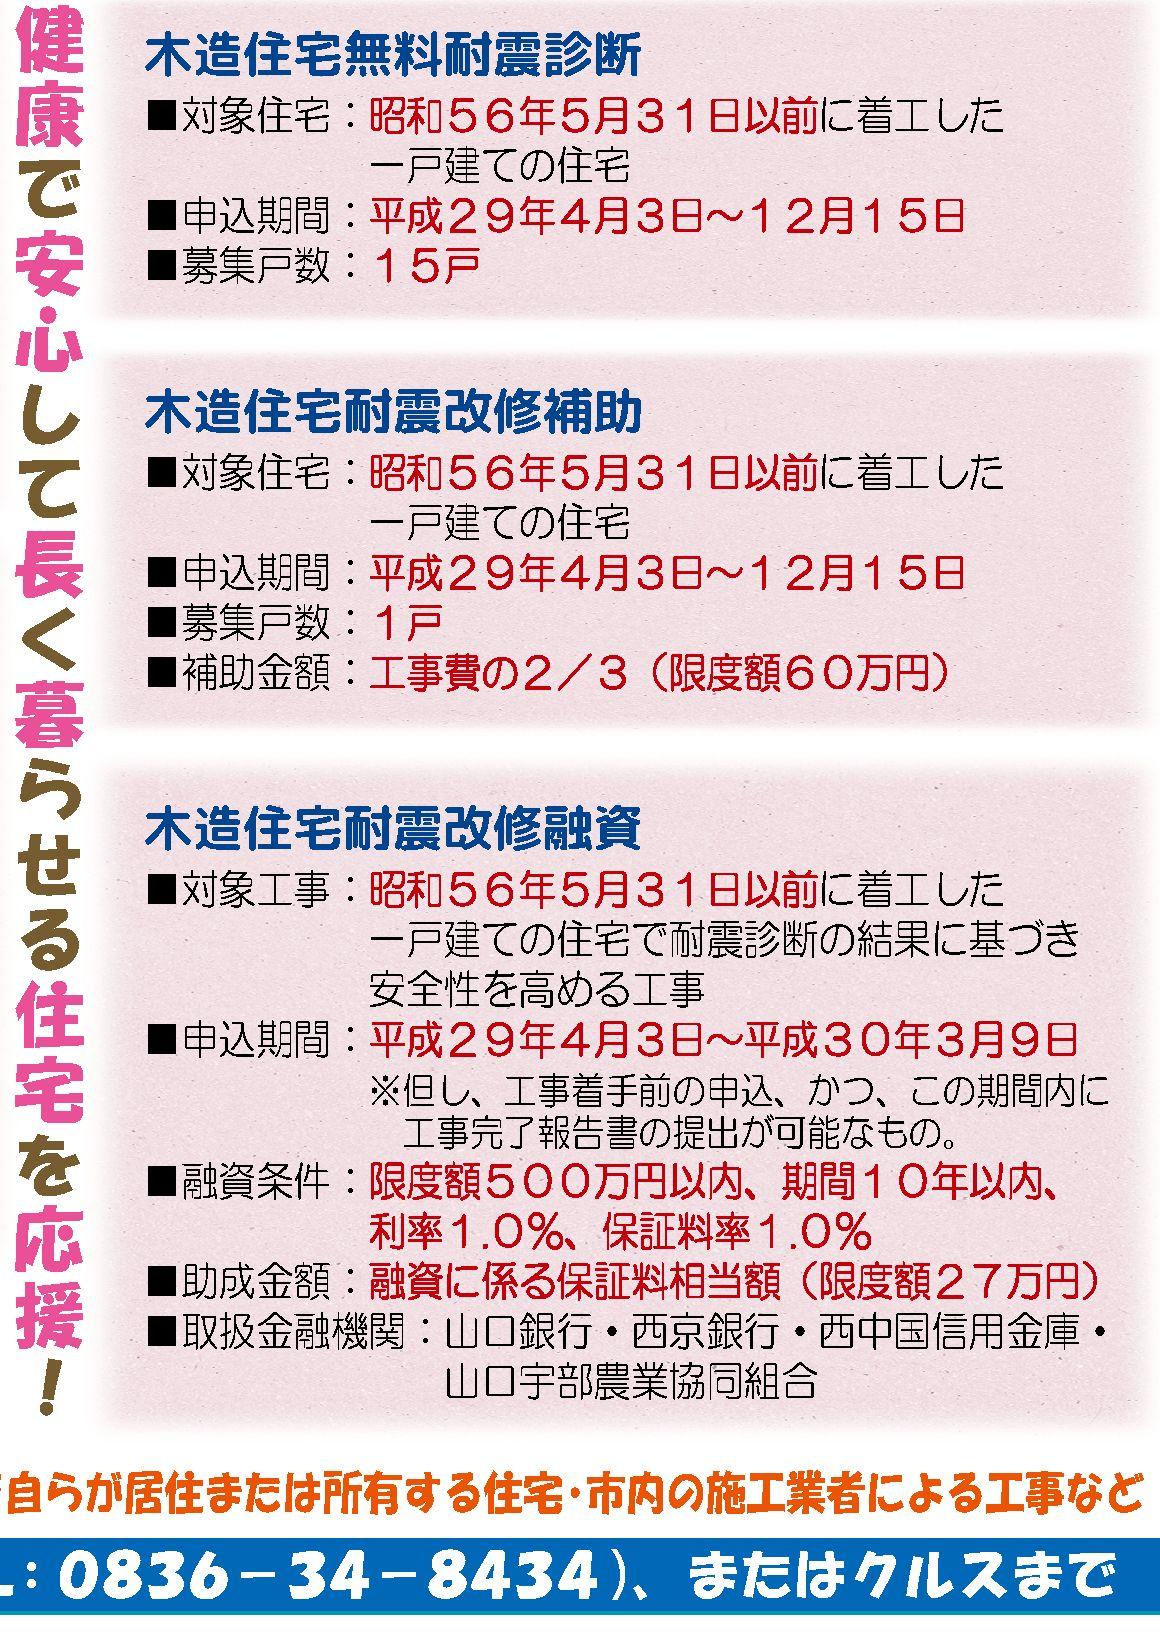 KuraSi-natu-sin103-18.jpg